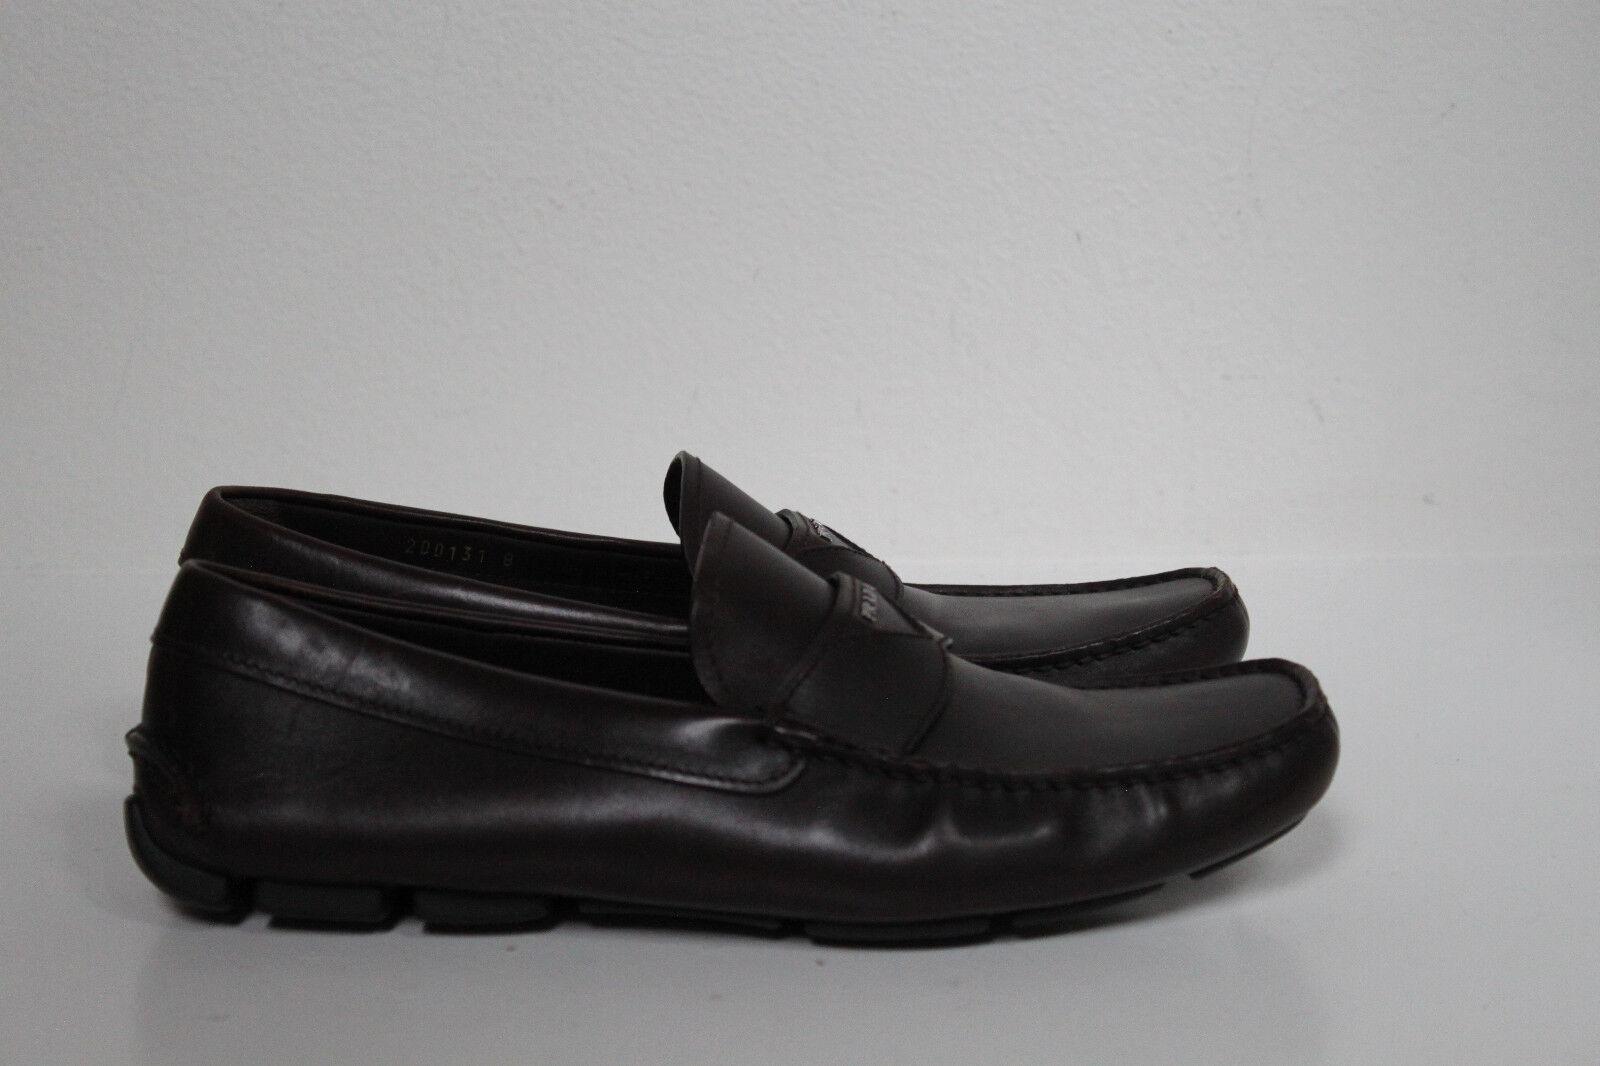 Sz 9 US   8 UK Prada Slip on Brown Leather Logo Driving Loafer Moccasin shoes